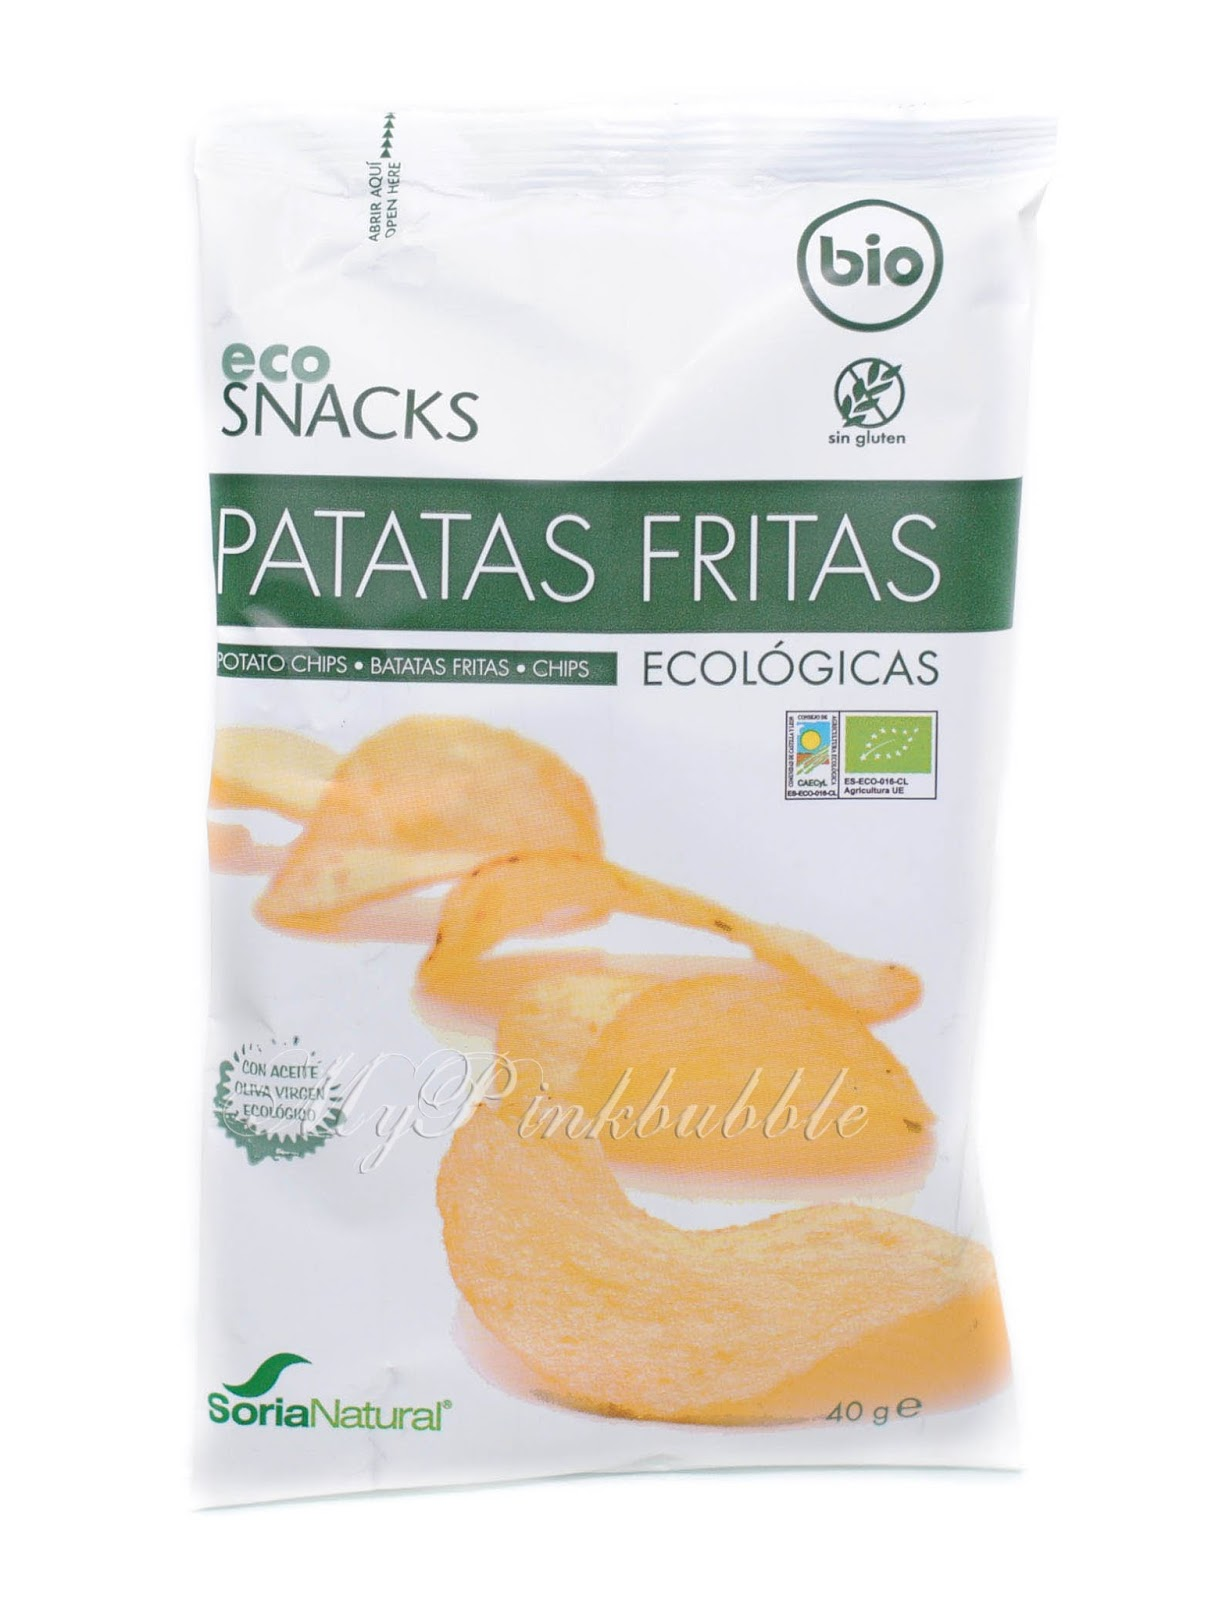 Soria Natural patatas fritas ecologicas